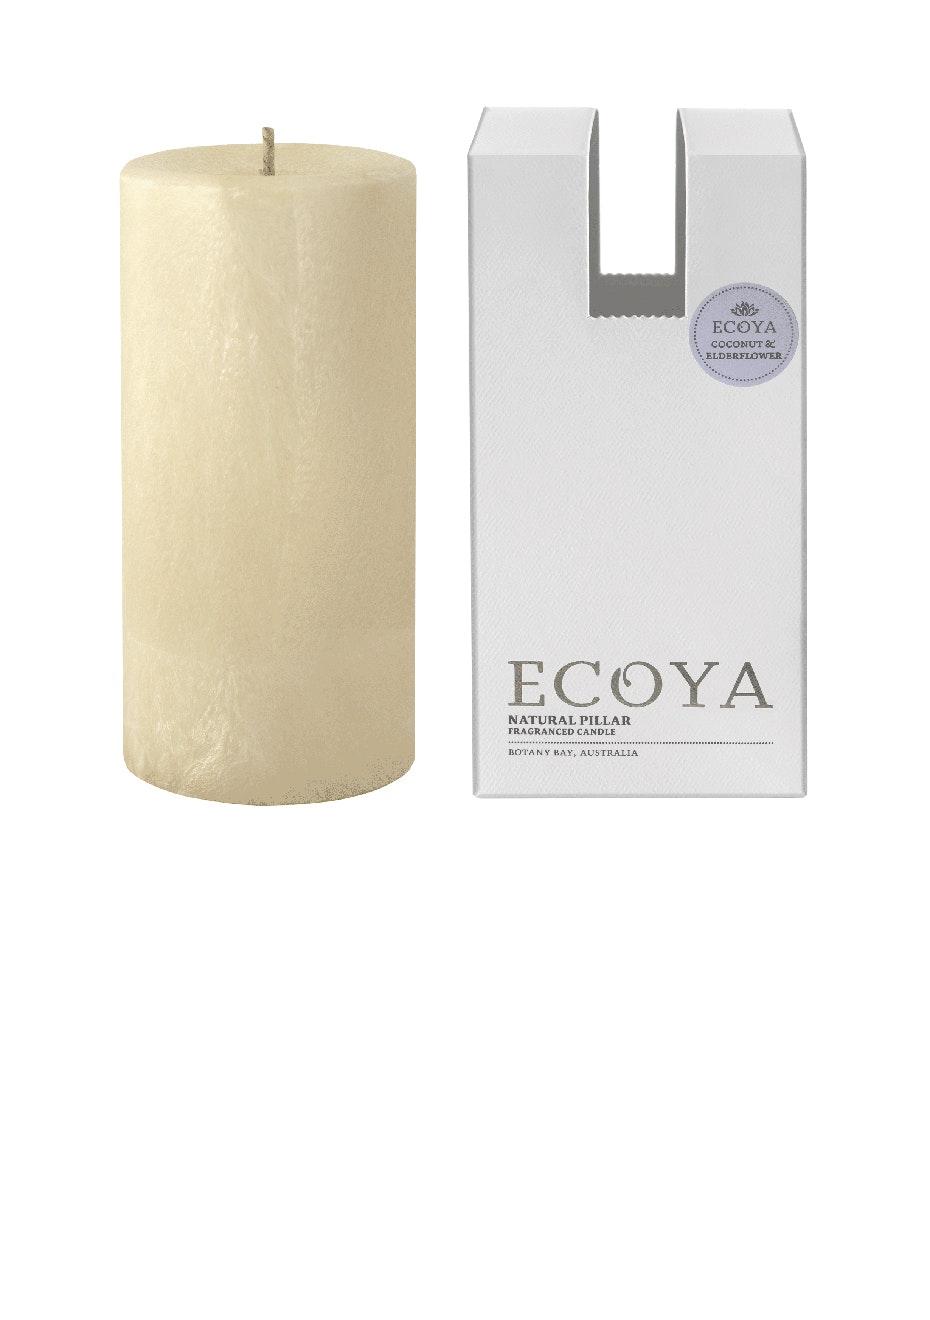 Ecoya - Pillar 75X155 Natural - Coconut & Elderflower